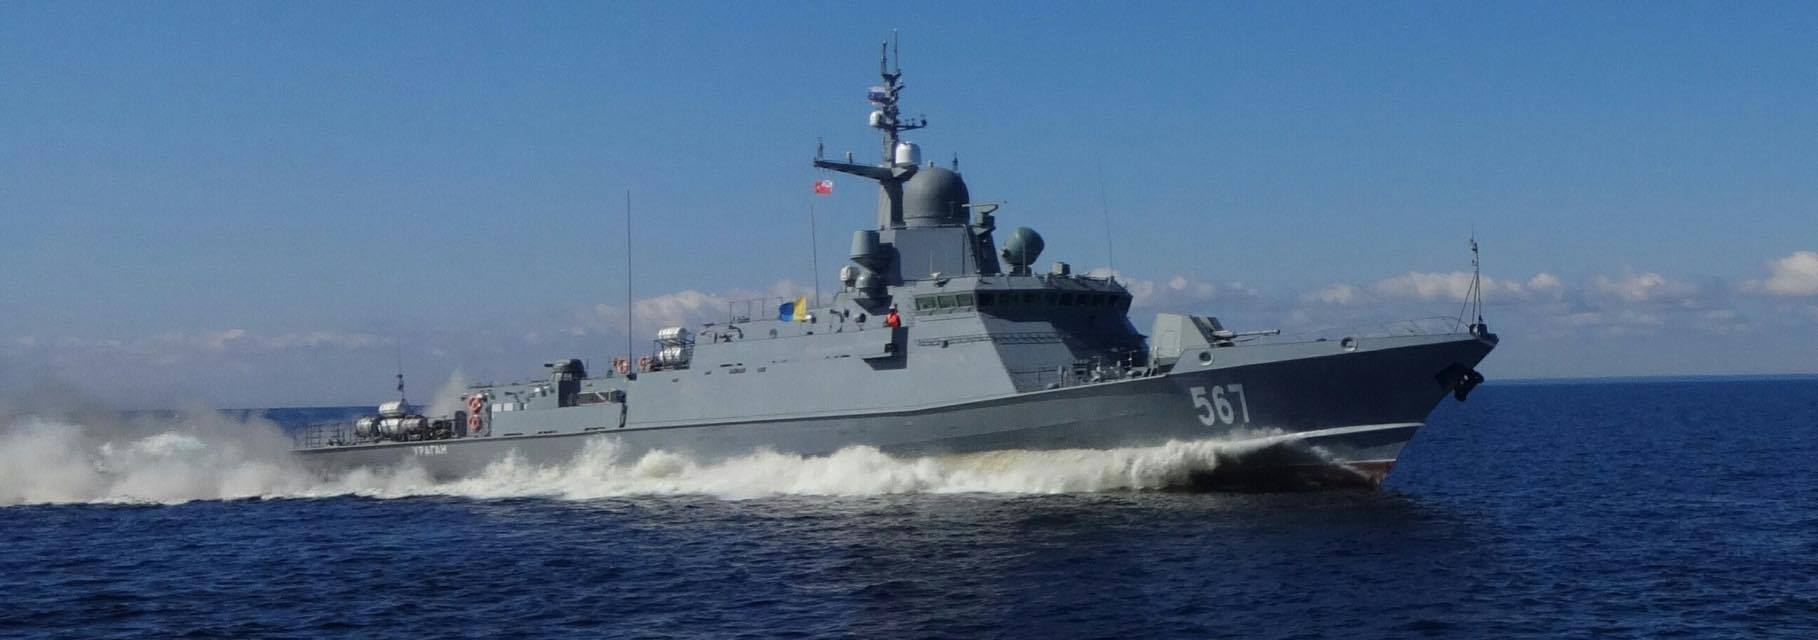 Corveta project 22800 Uragan, realiza testes no lago Ladoga